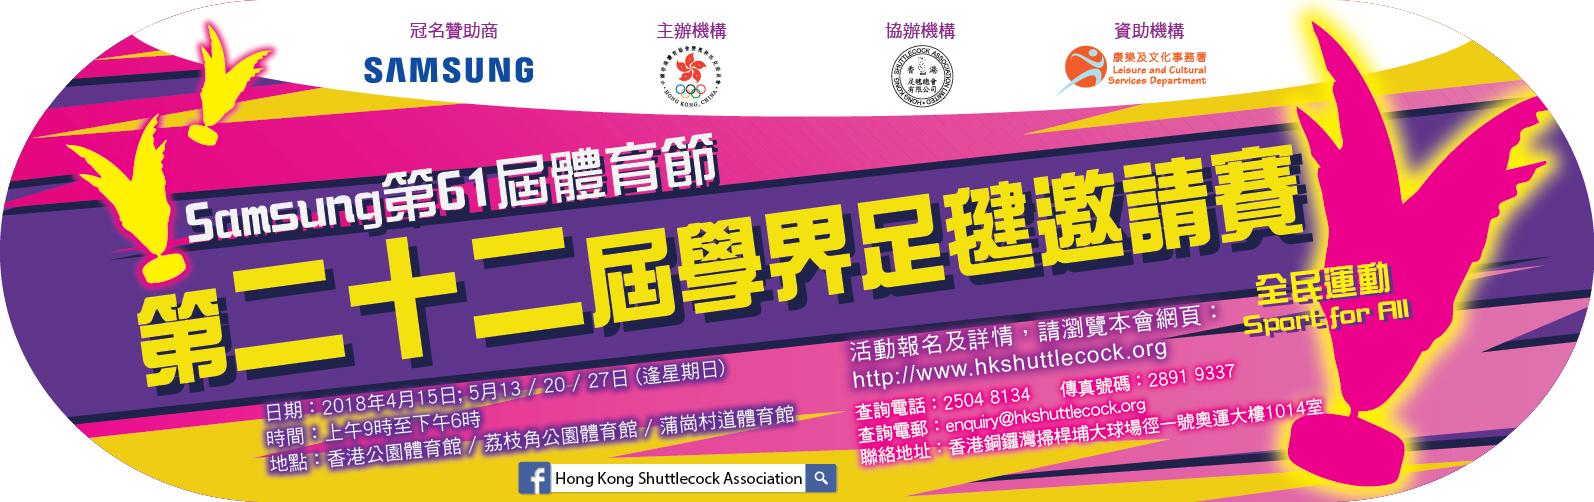 Samsung 第 61 屆體育節 – 第 22 屆學界足毽邀請賽 【平推毽賽 】